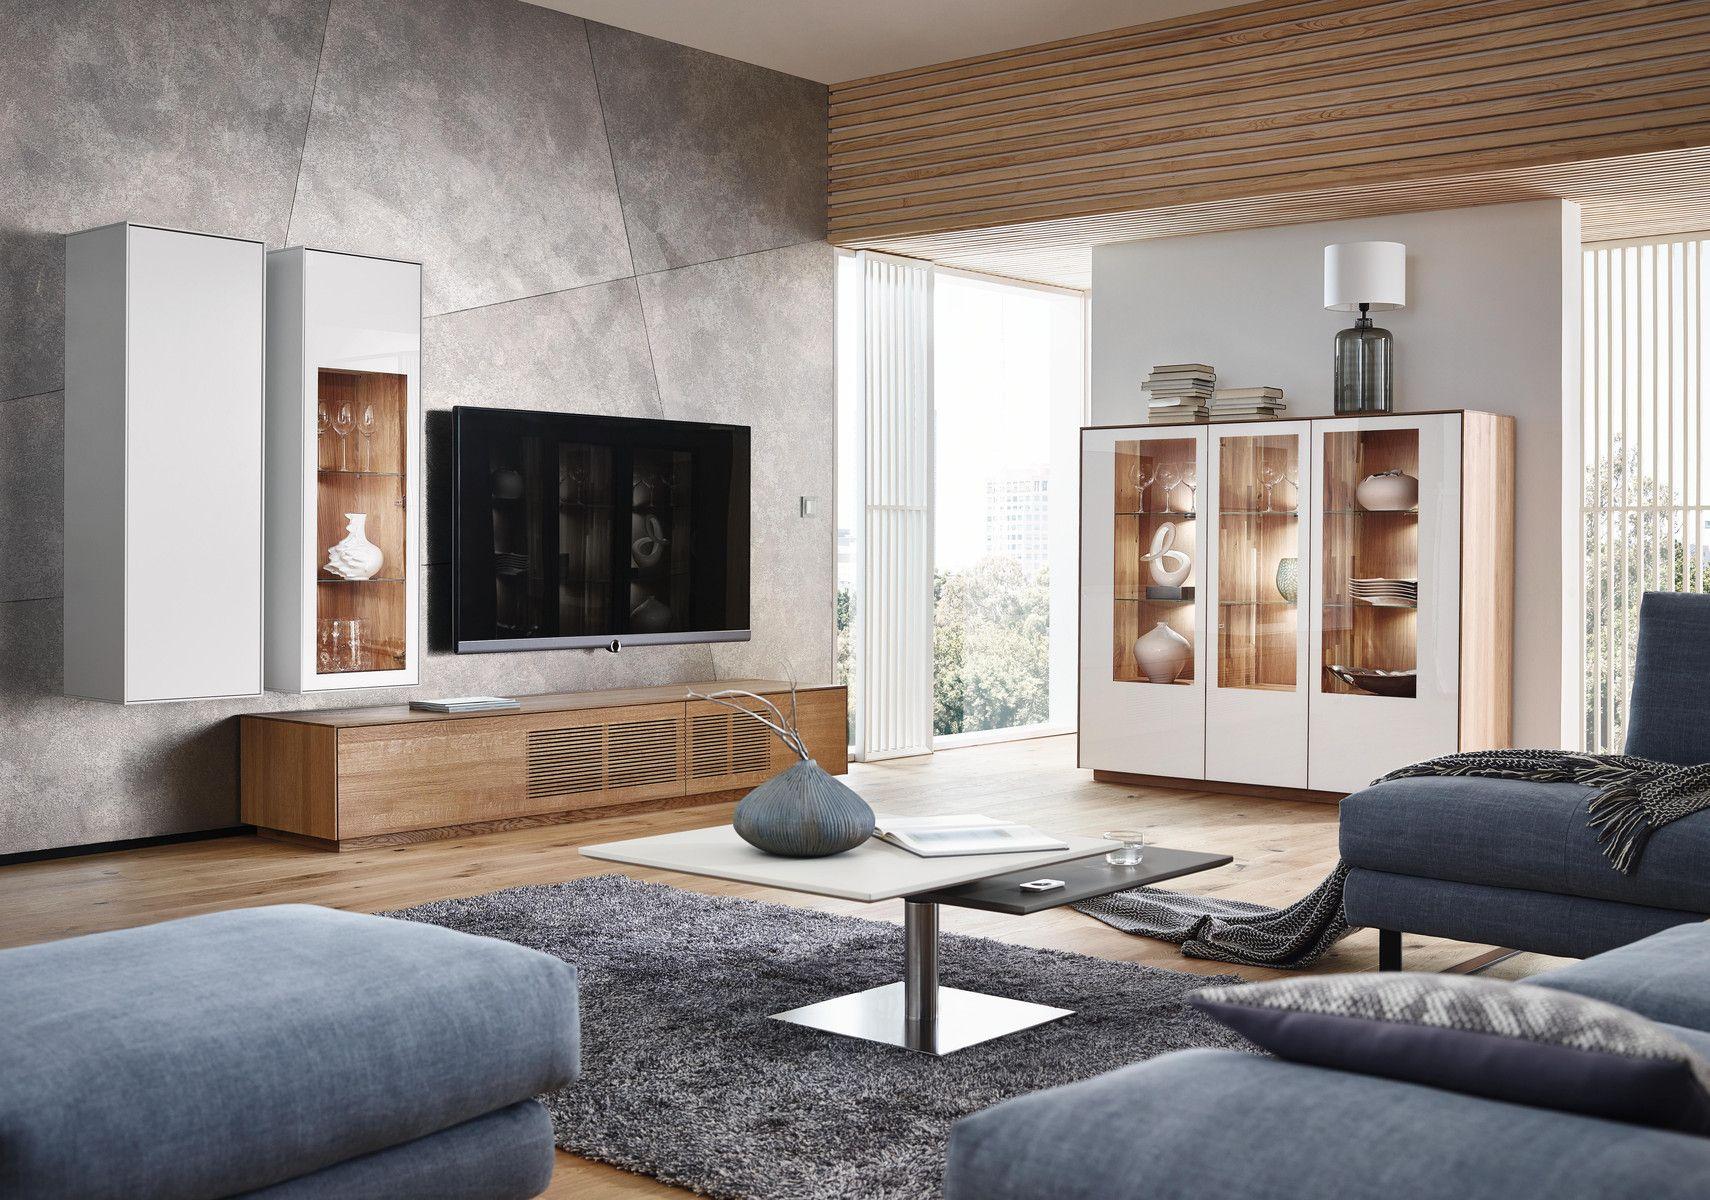 gartenm bel n rnberg f rth kollektion ideen garten. Black Bedroom Furniture Sets. Home Design Ideas